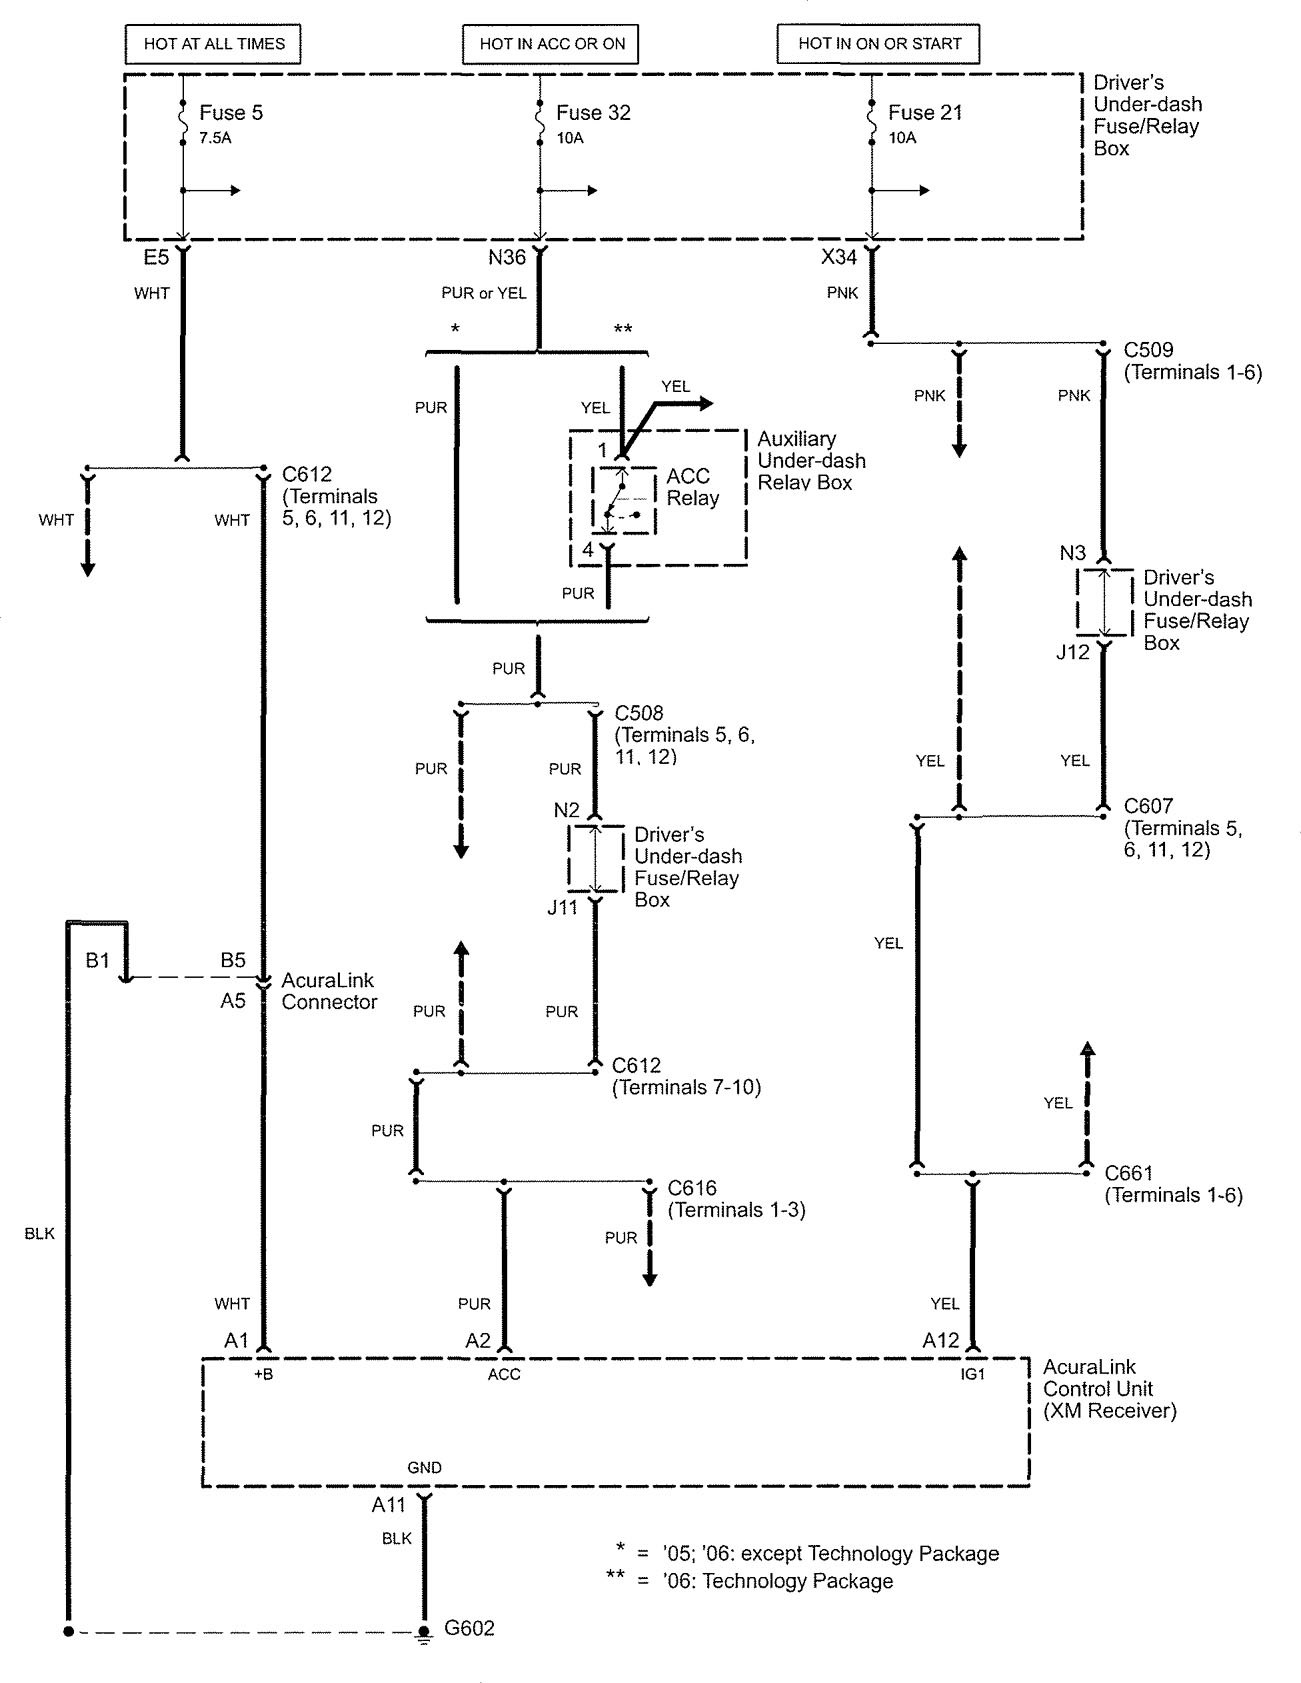 2006 Acura Rl Wiring Wire Center Diesel Tach Http Wwwbenzworldorg Forums W123ecedcdtd Diagrams Navigation System Carknowledge Rh Info 2007